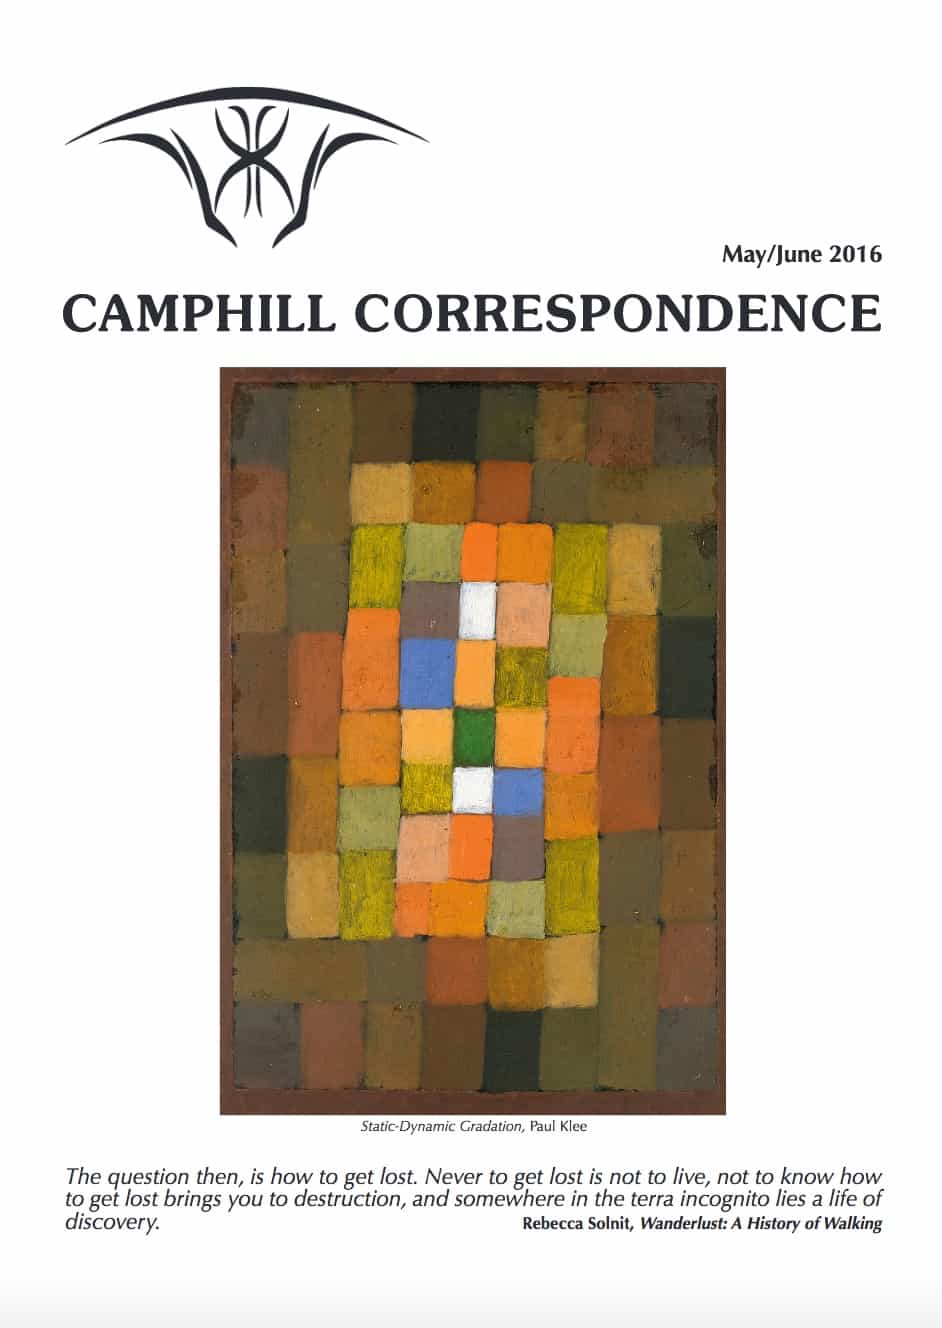 Camphill Correspondence May/June 2016